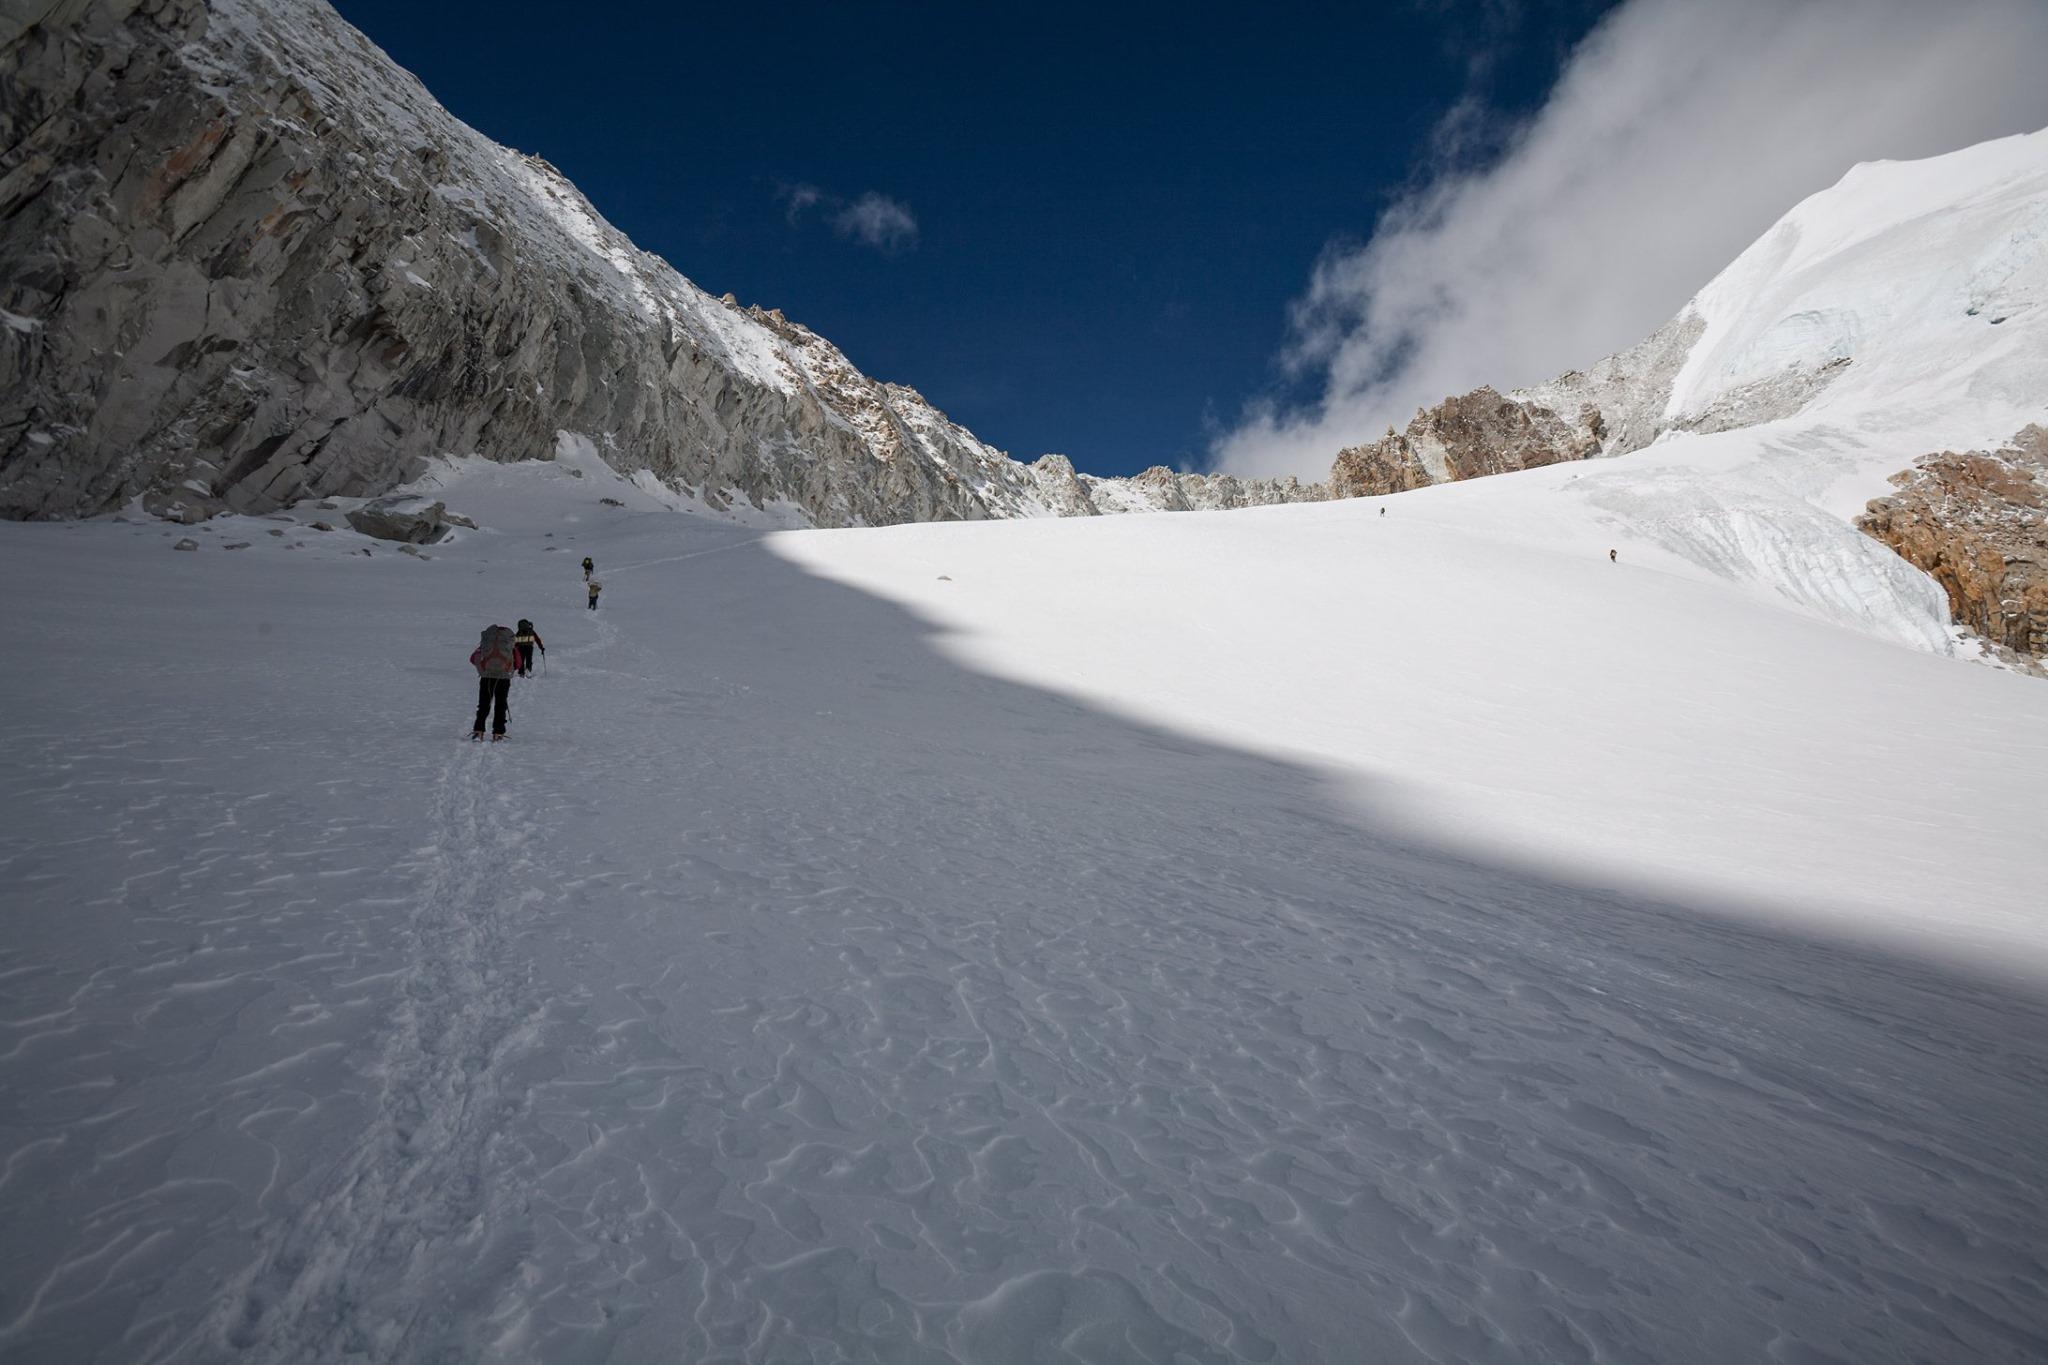 Makalu Base Camp and Sherpani Col Trek – 26 days